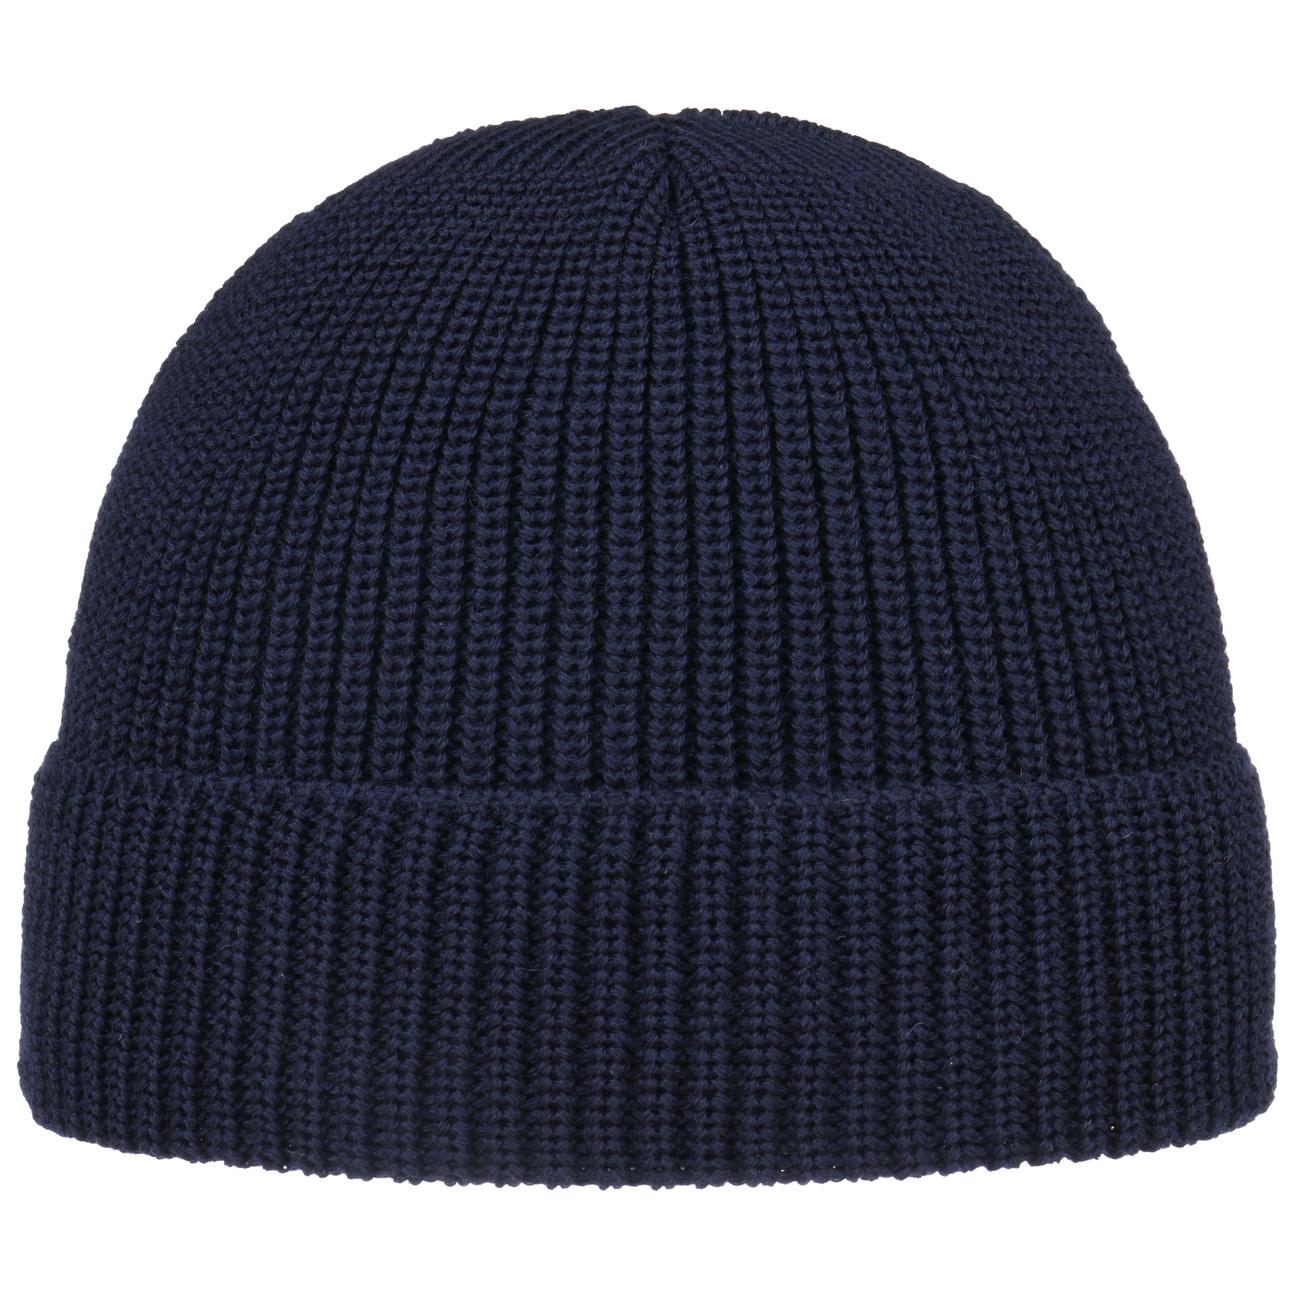 879310d6f88 ... Dock Worker Knit Hat with Teflon - blue 1 ...